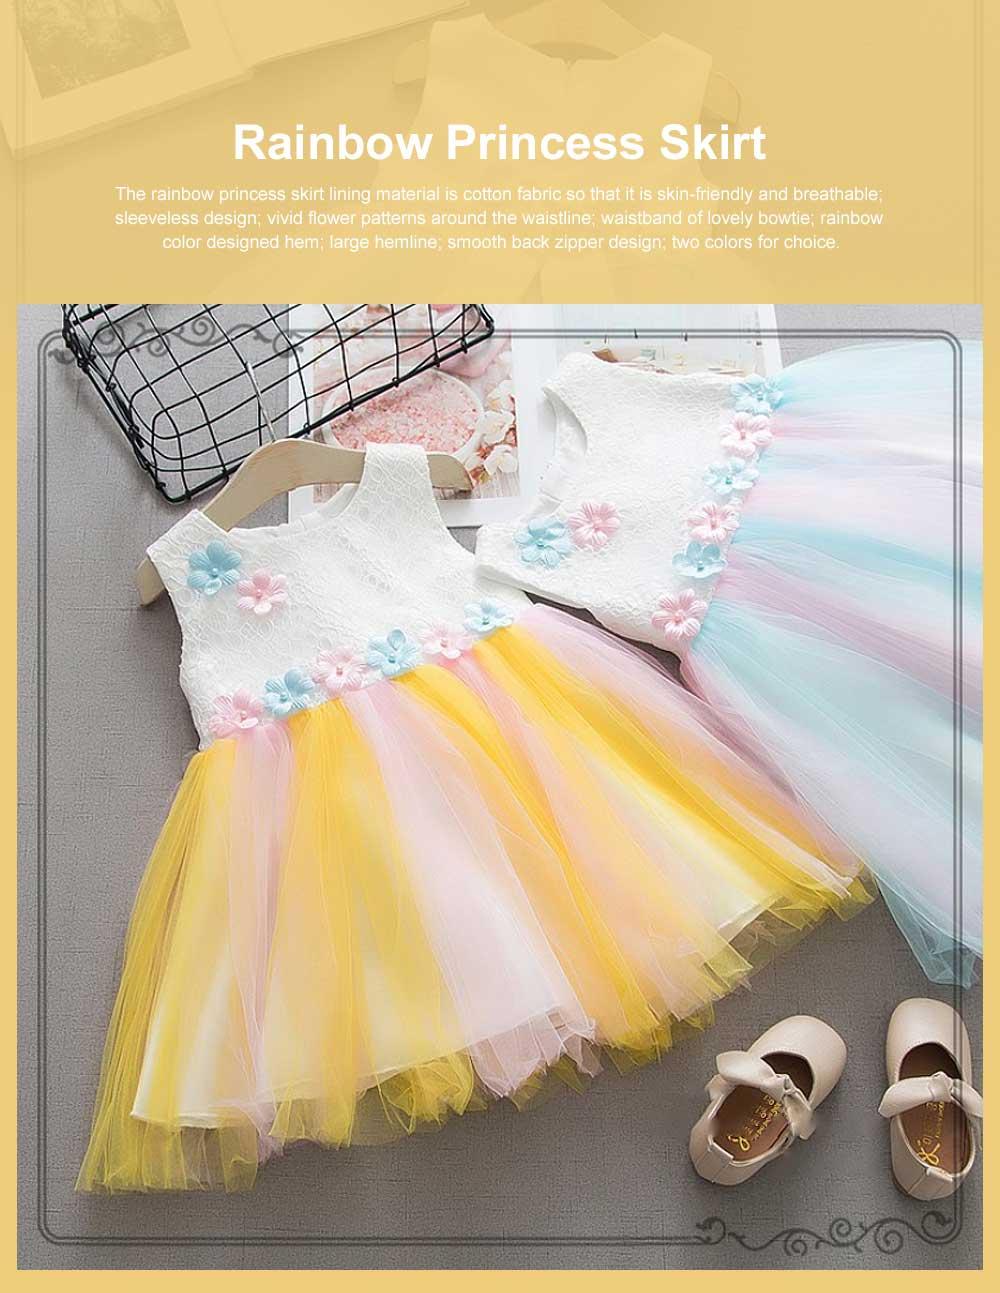 Rainbow Color Princess Skirt for Girl Kids, Summer Wear Korean Style Sleeveless One-piece Dress Princess Skirt for 1-3 Years 0